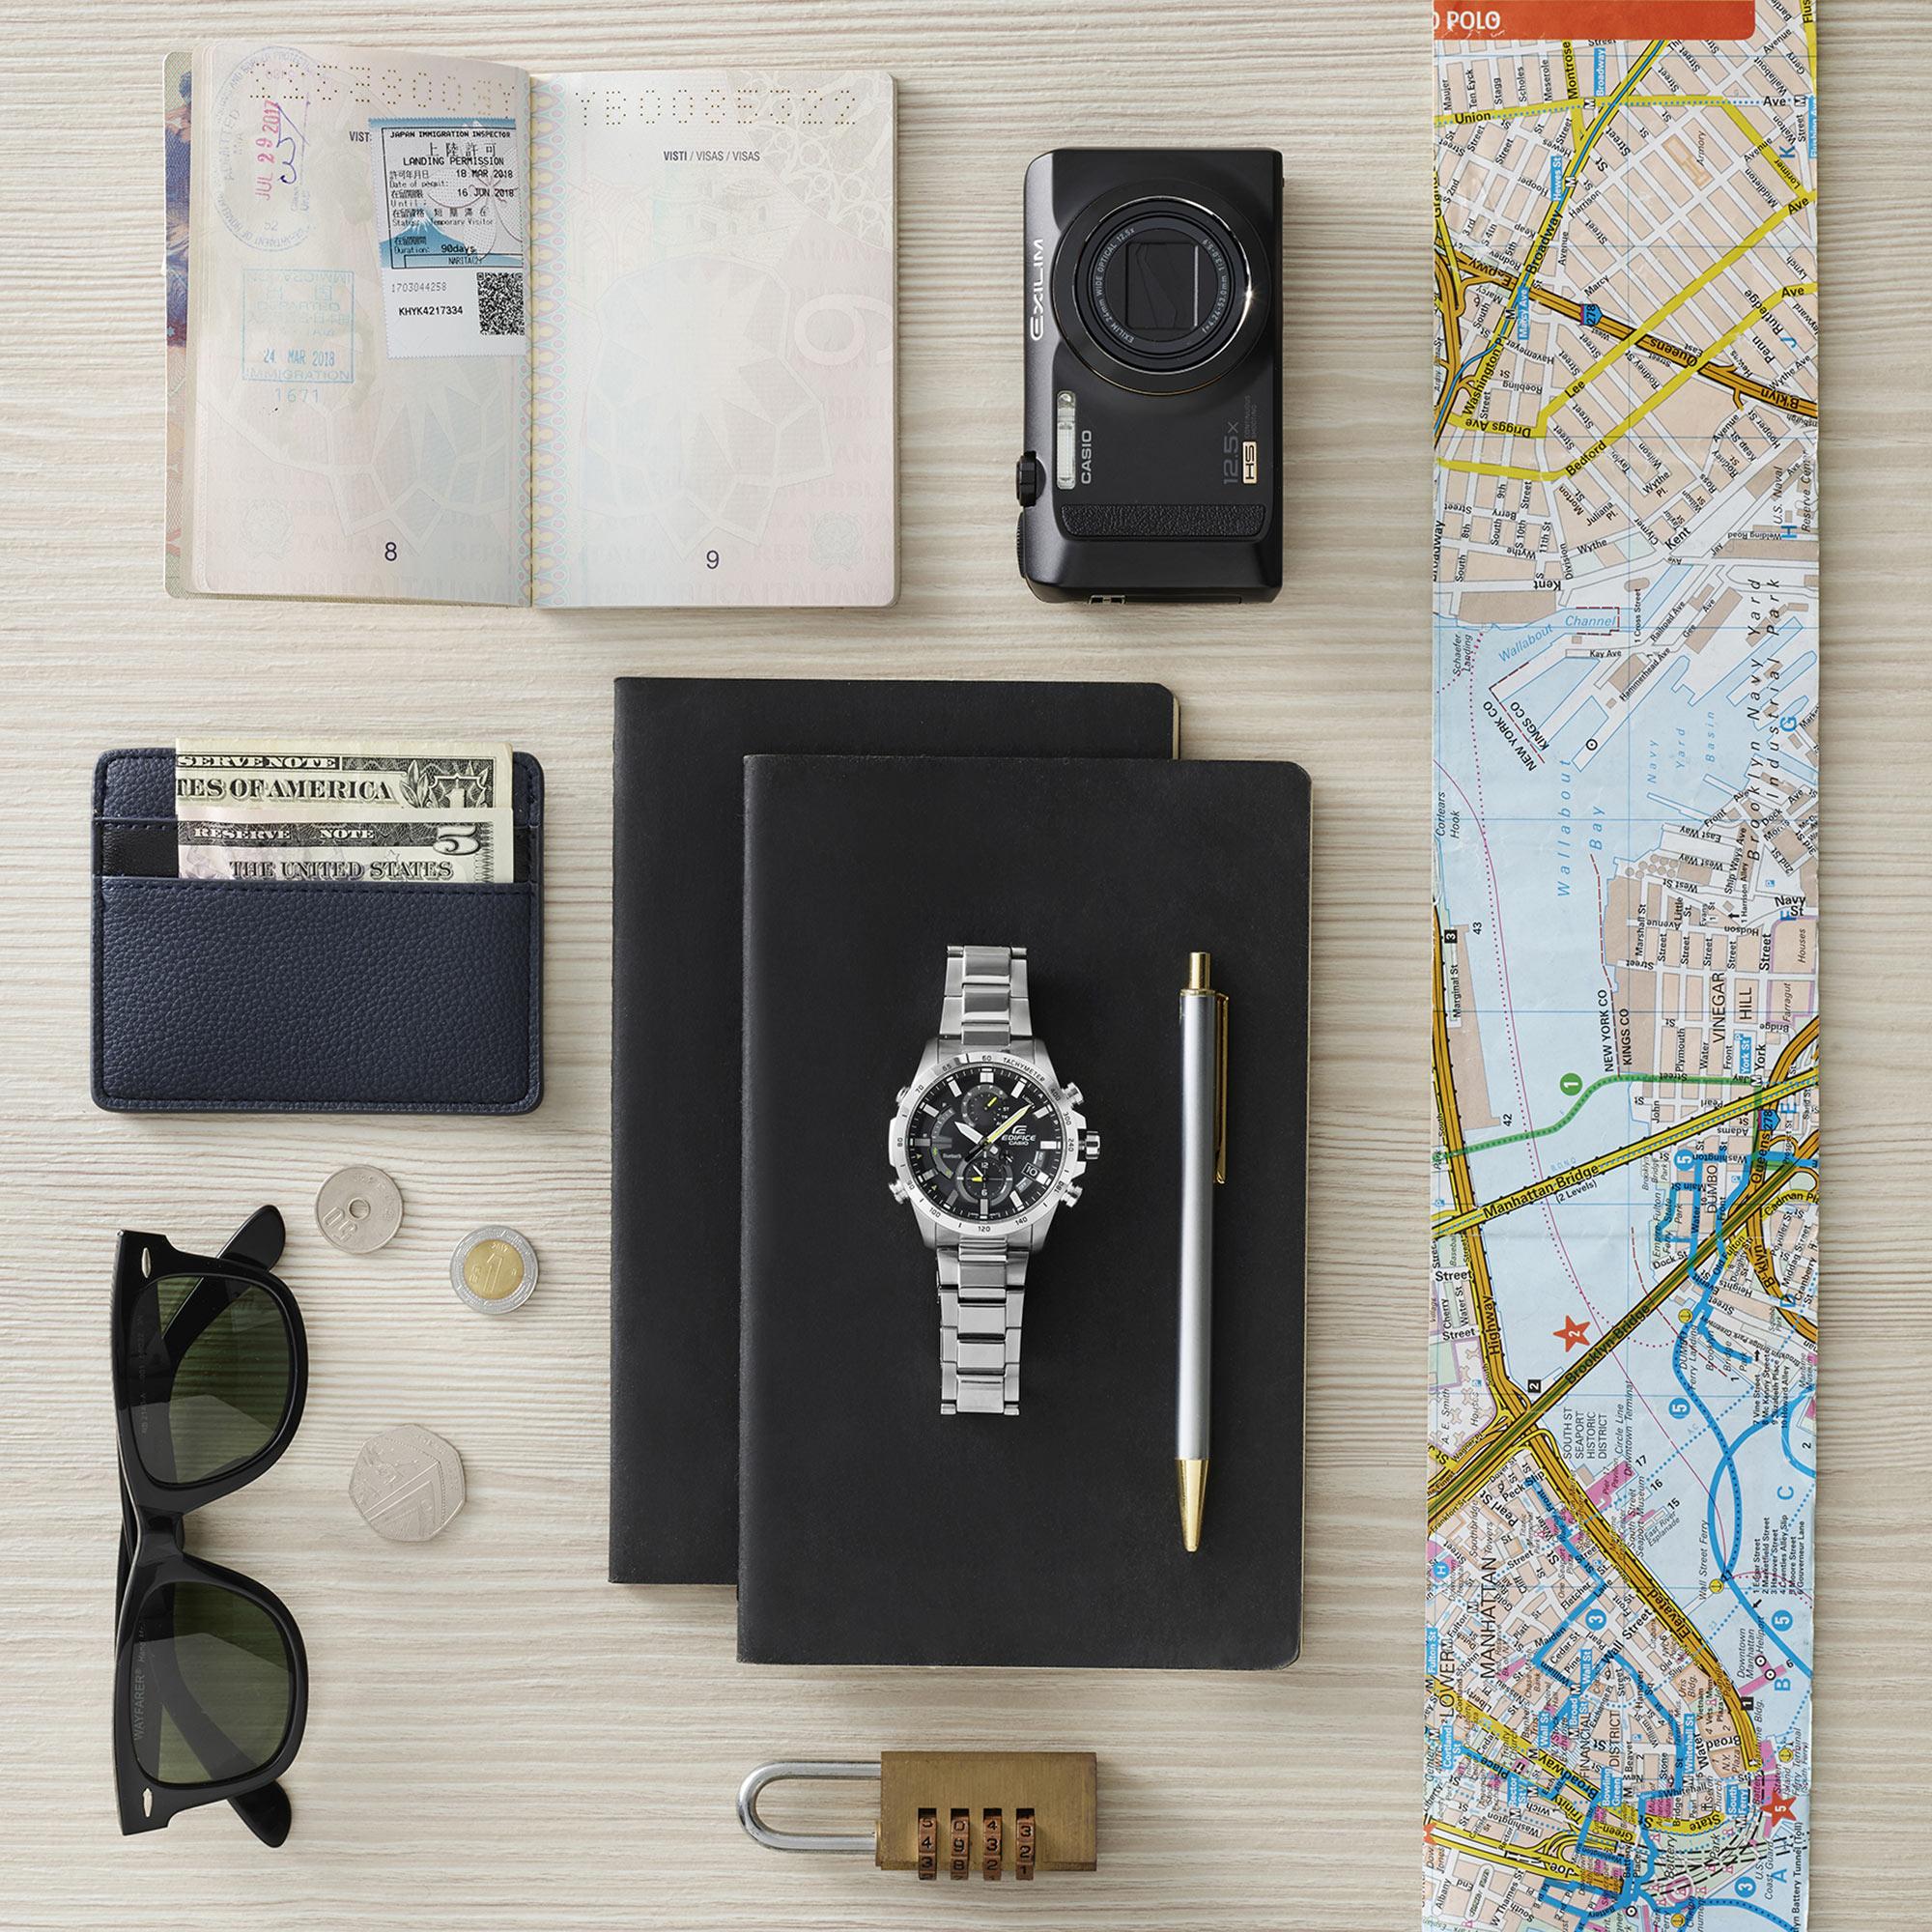 Man Map Glasses Coins Pen Locker Still Life Shot for Casio by Fotografando